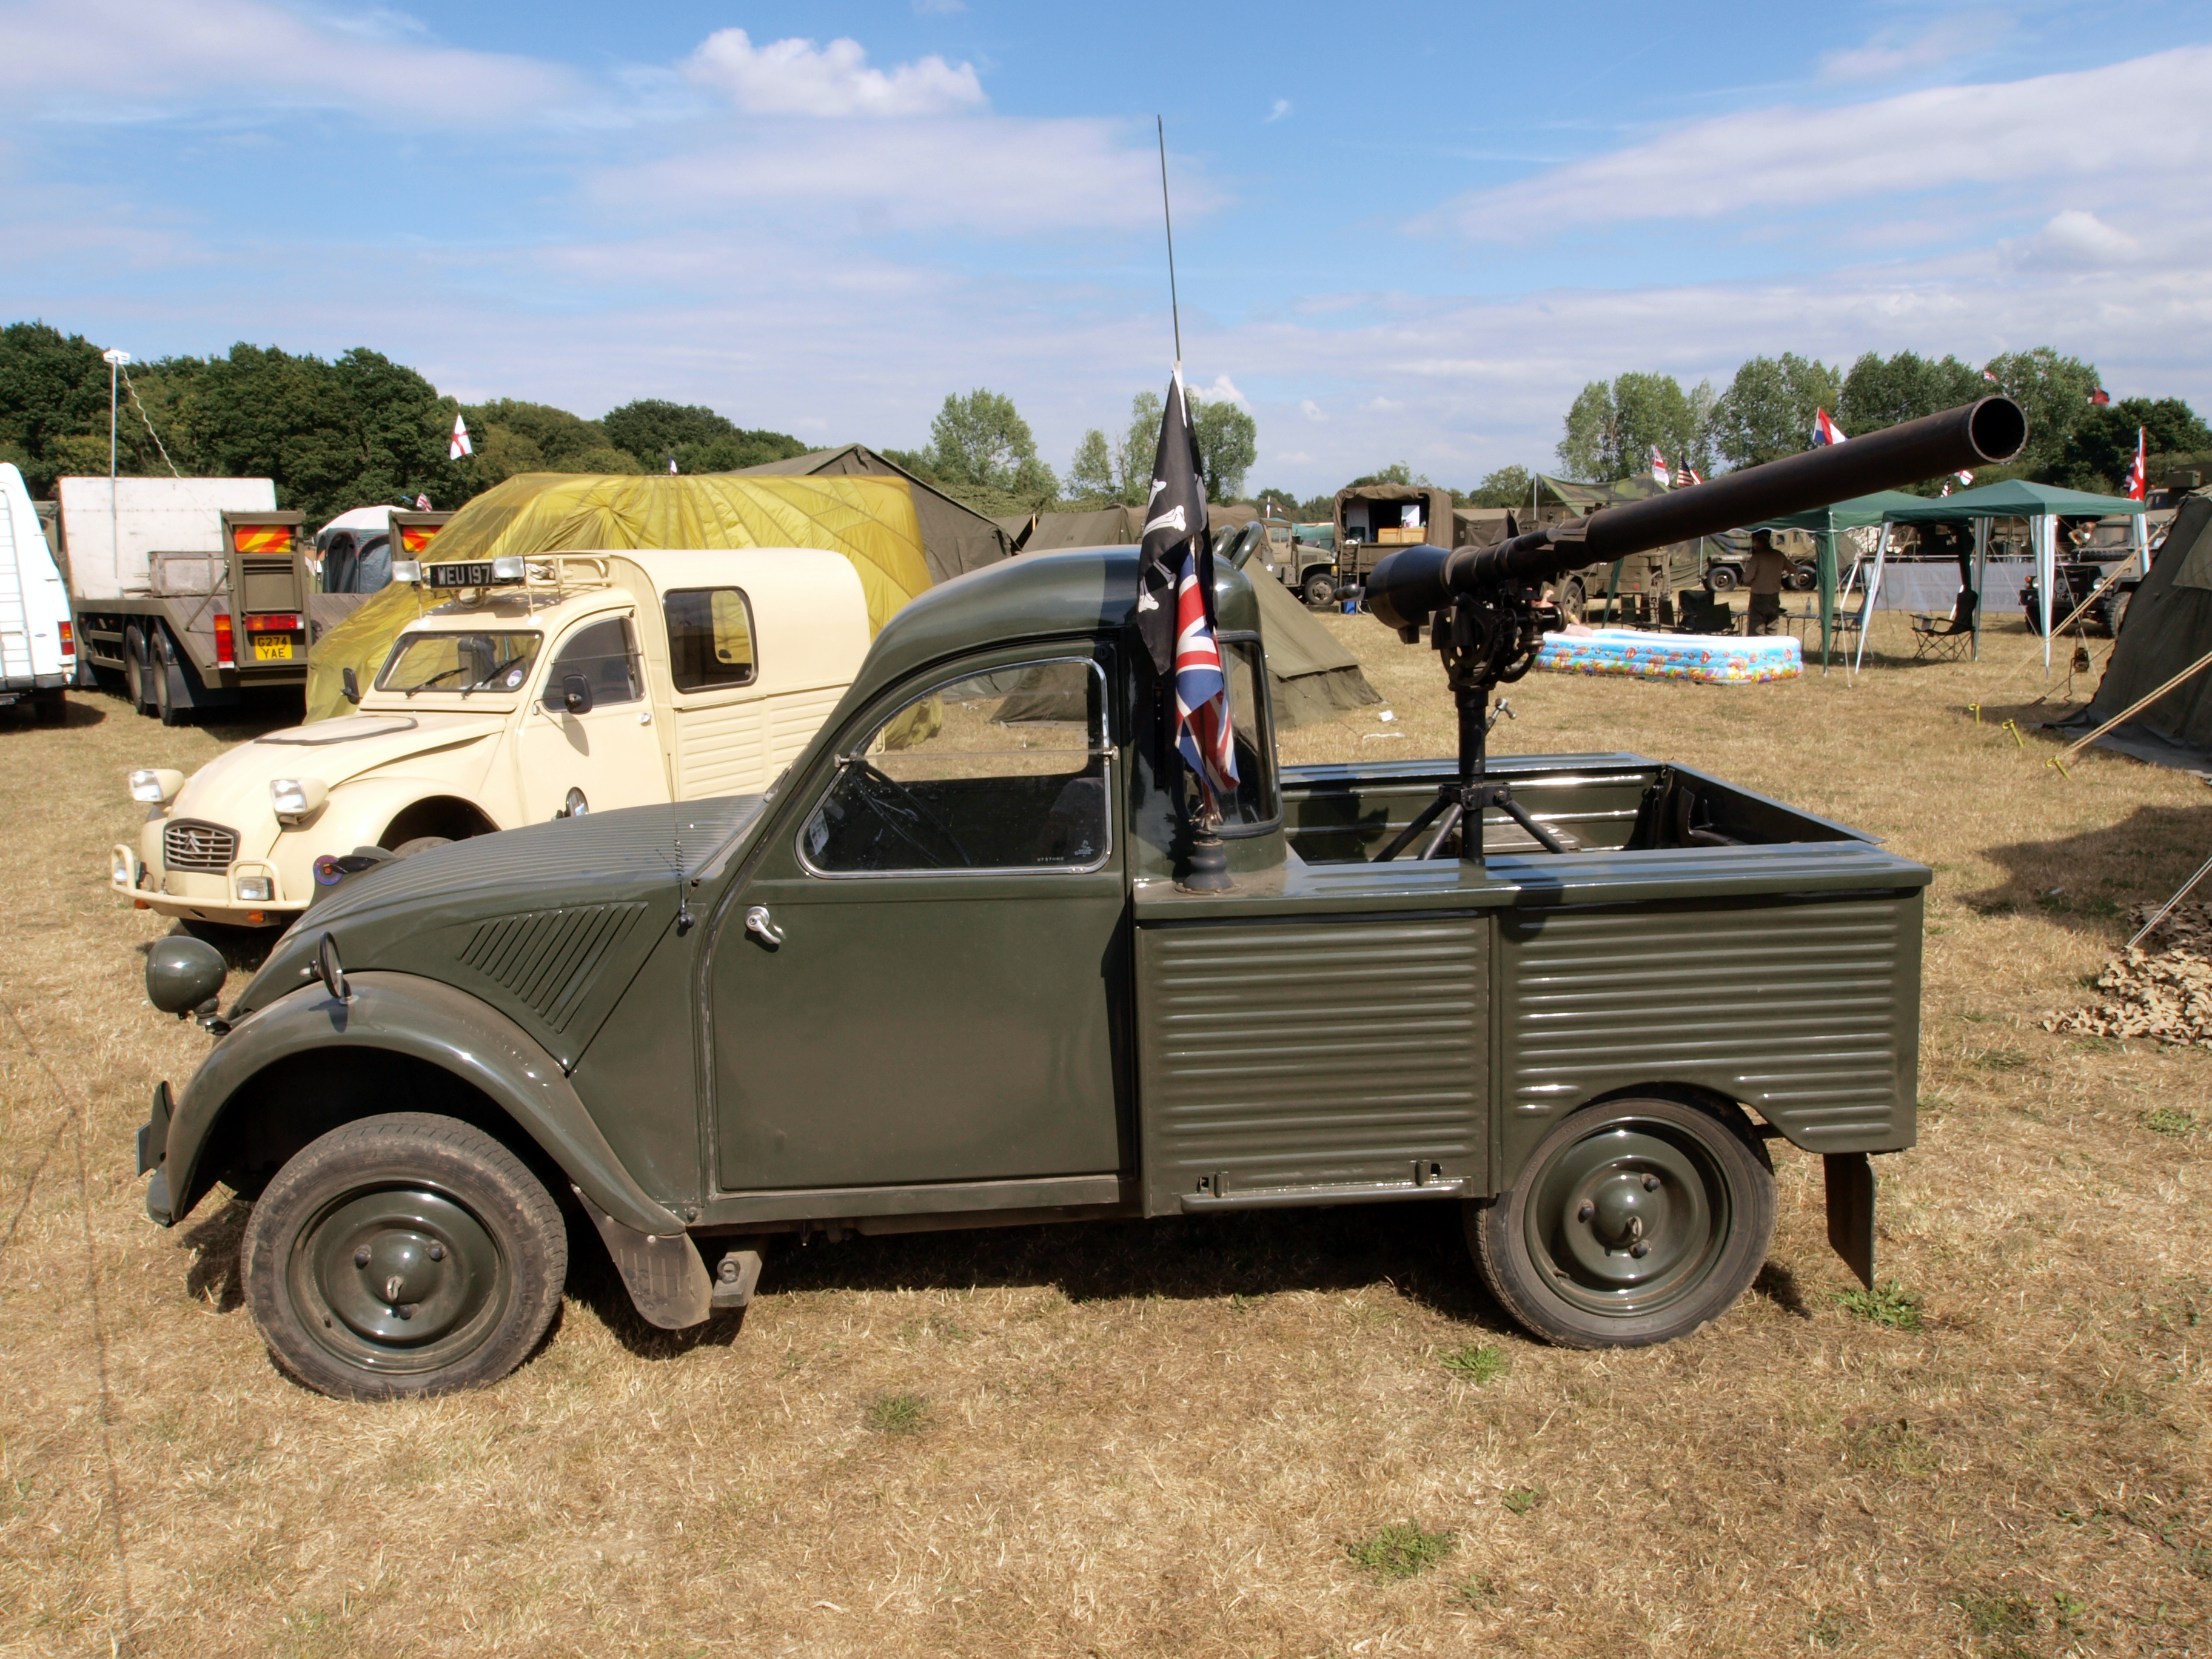 Free Classic Car Values Online